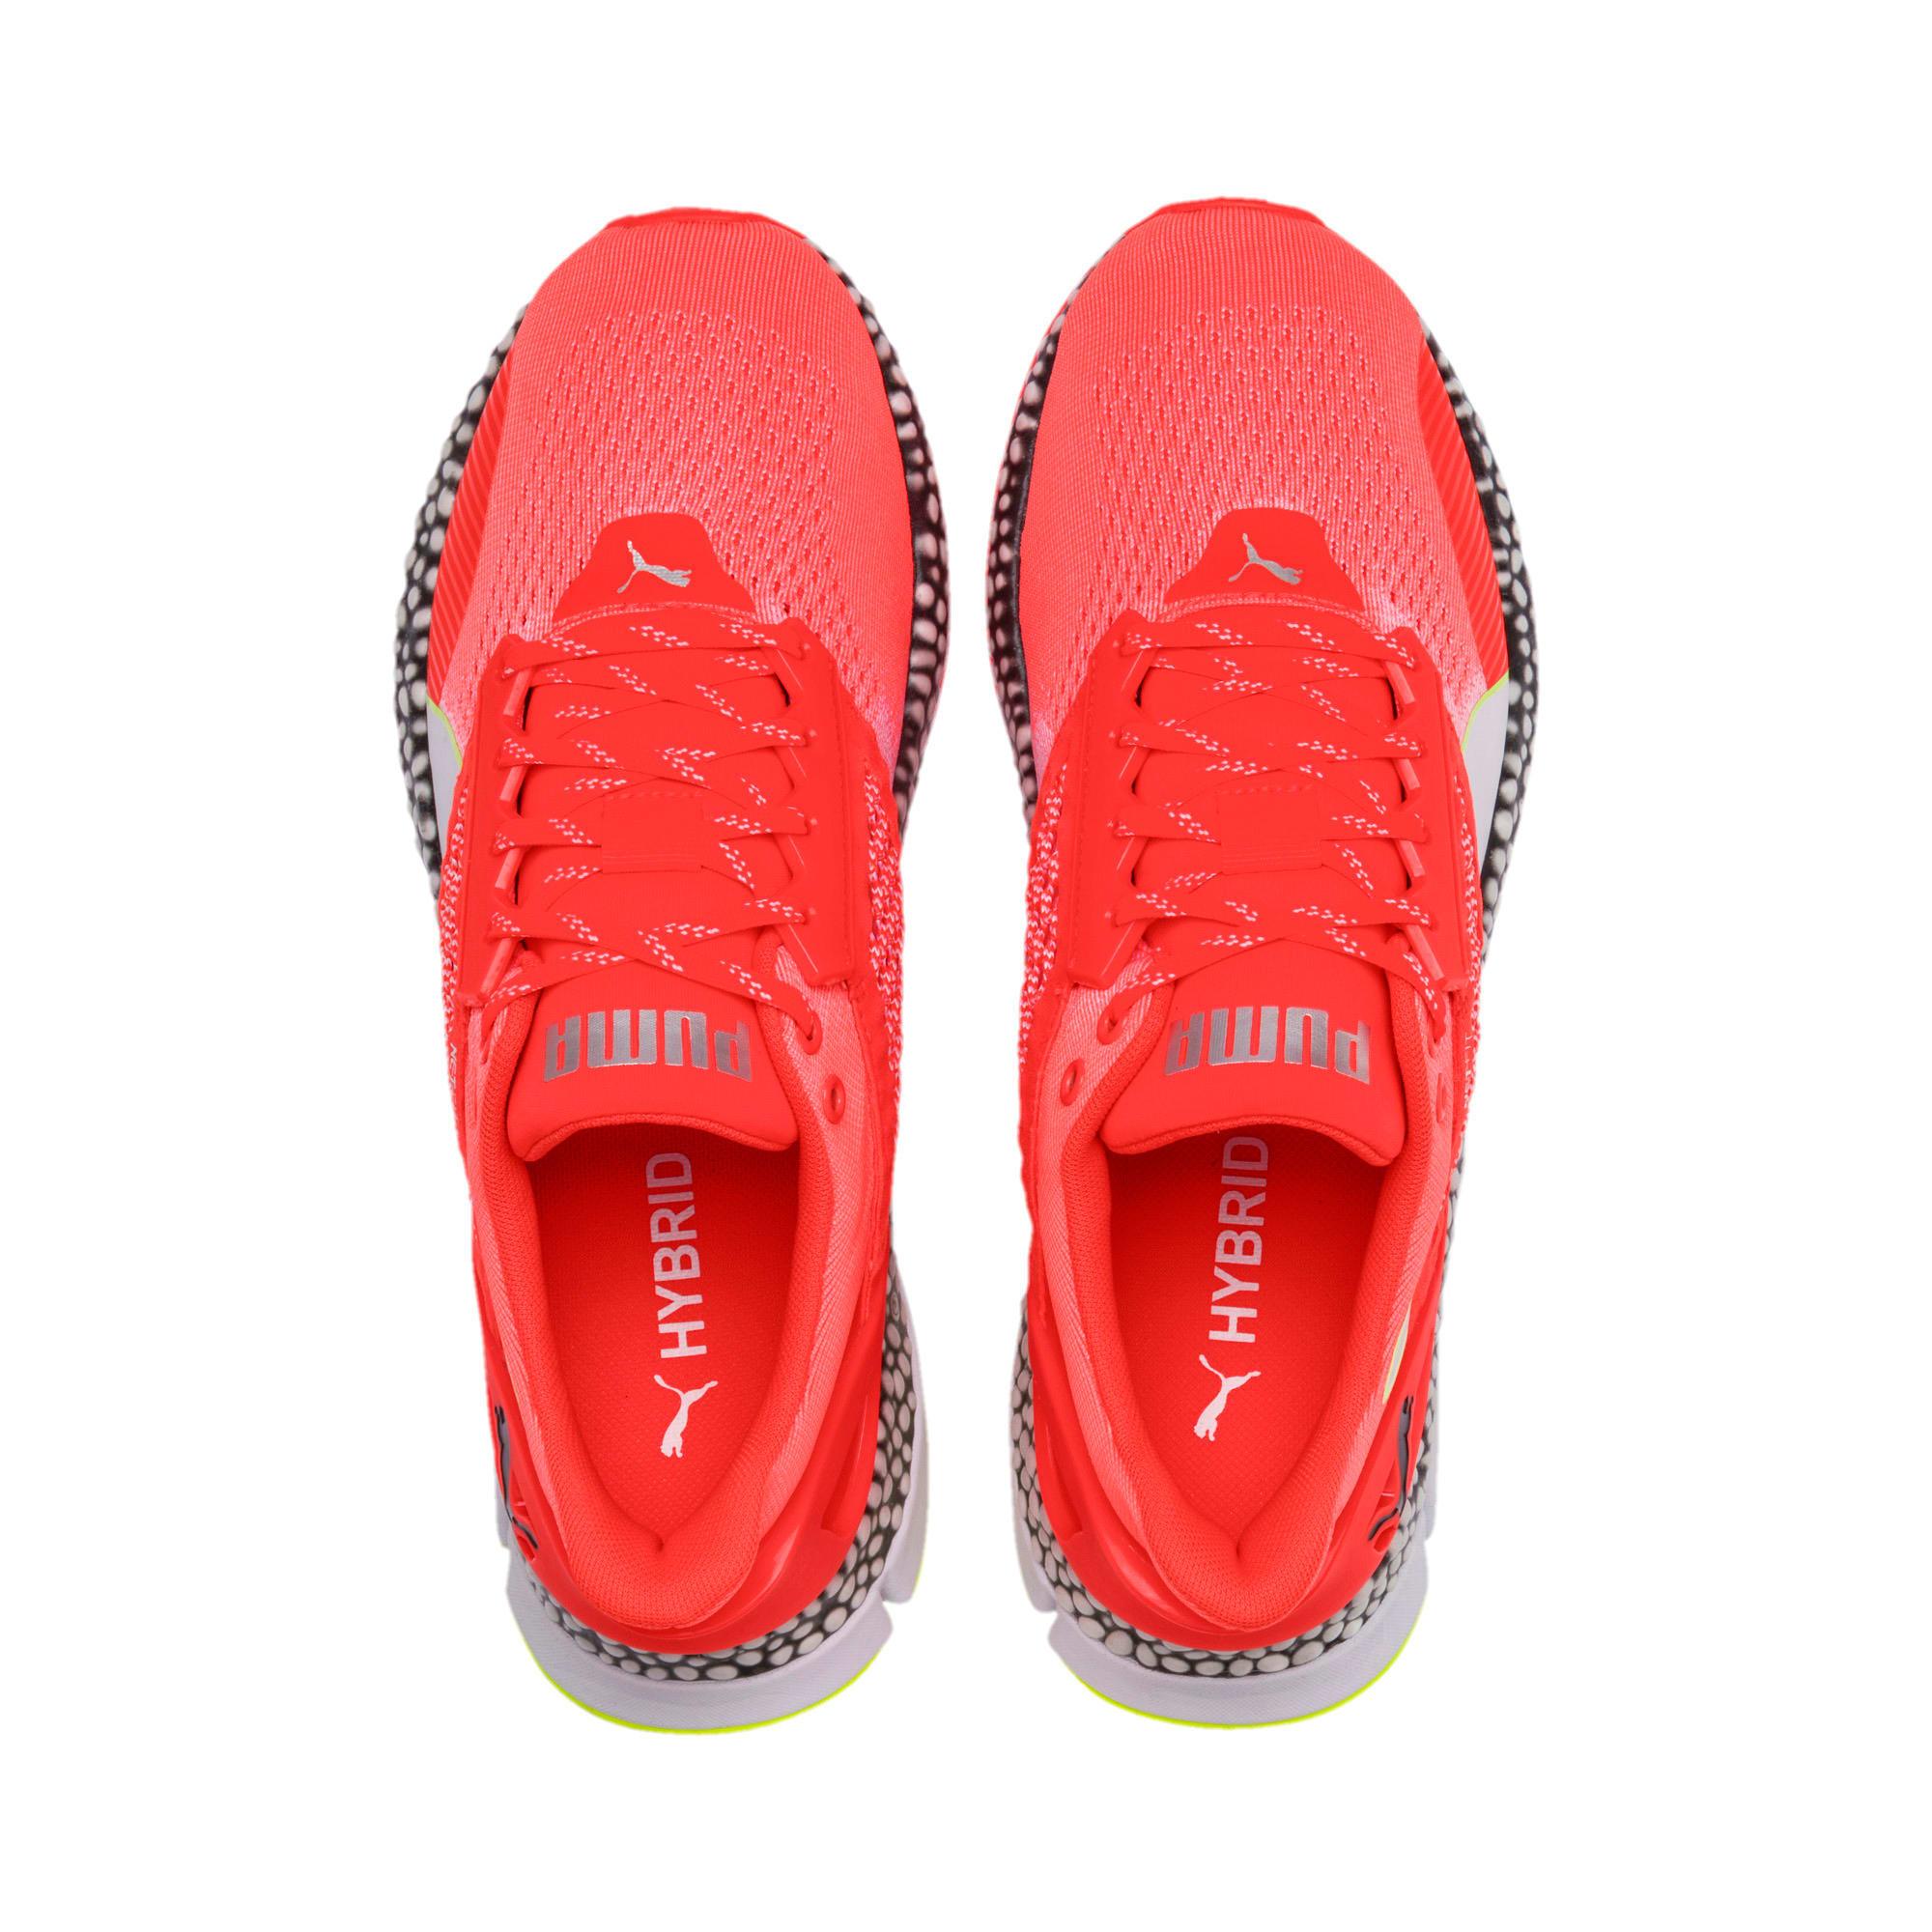 Thumbnail 8 of HYBRID Astro Men's Running Shoes, Nrgy Red-Puma Black, medium